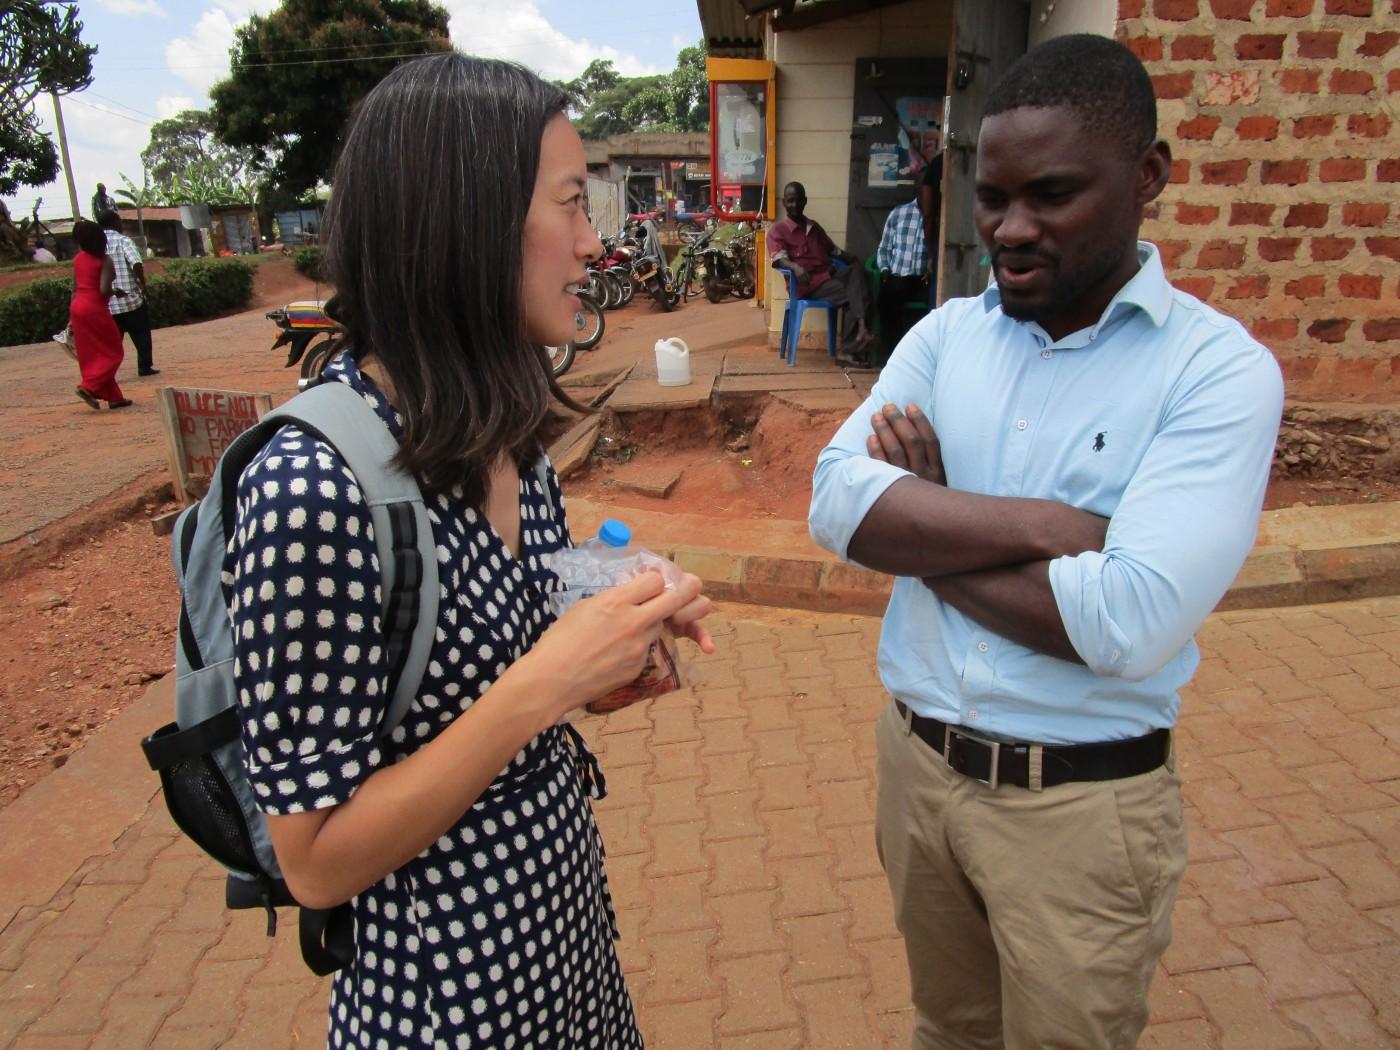 NGN member Dr. Evelyn Hsieh, talking with Dr. Richard Munana, a doctor at ACCESS, outside Nakaseke Hospital.